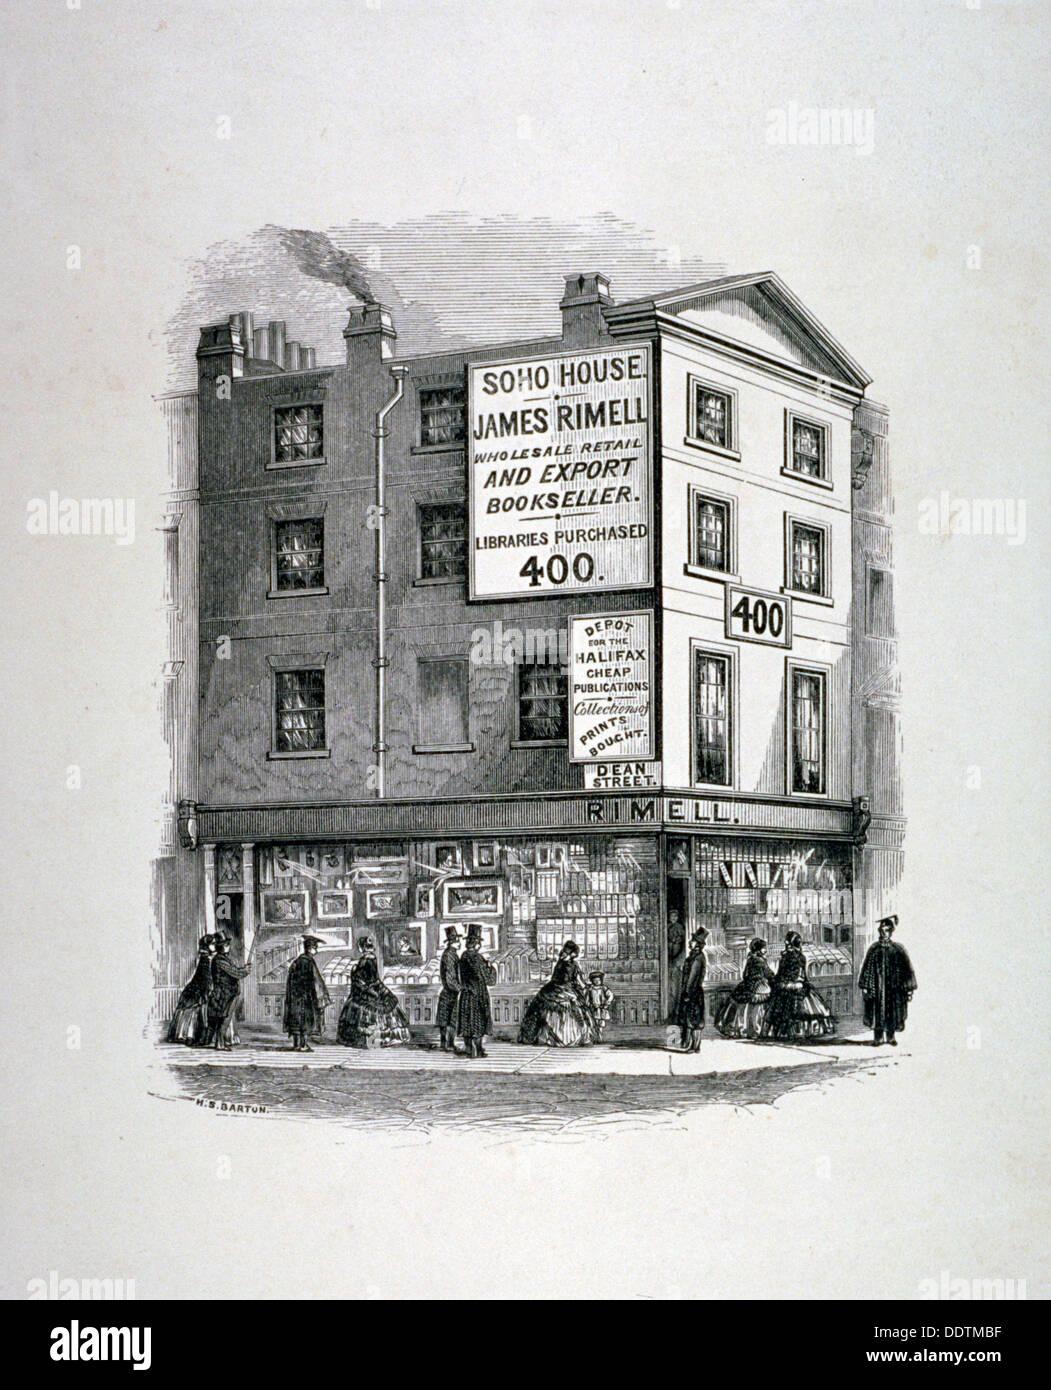 James Rimell's bookshop, Soho House, corner of Dean Street and Oxford Street, London, c1860. Artist: Anon - Stock Image